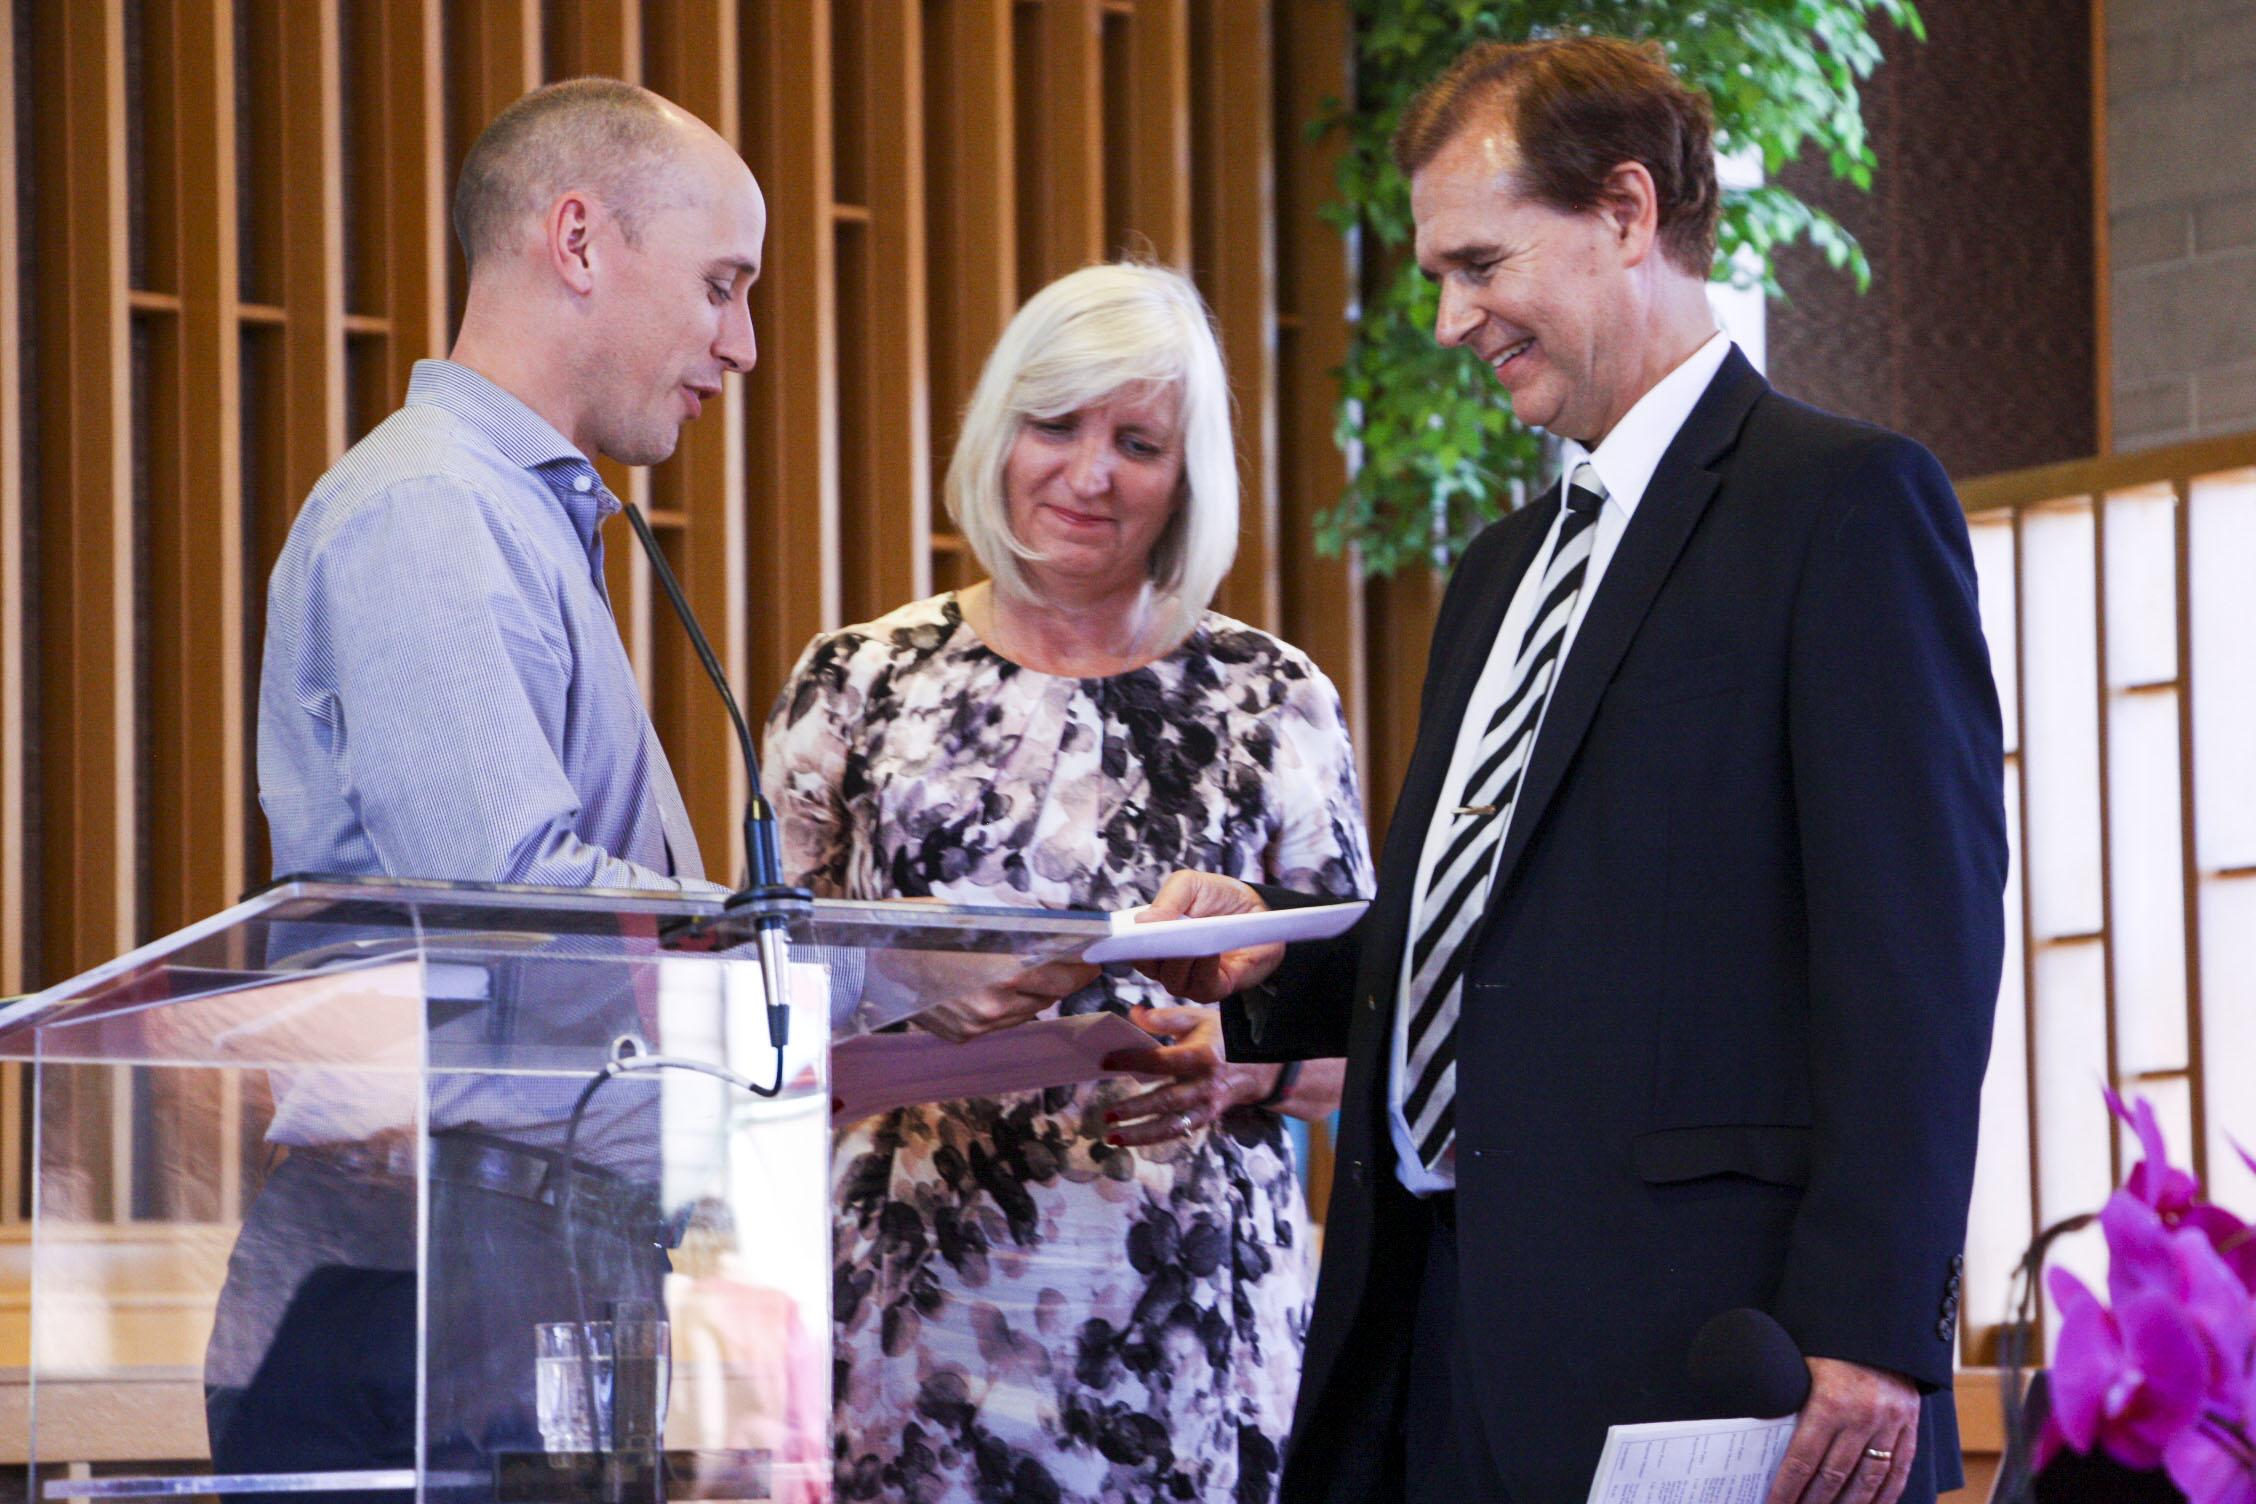 Induction – Pastor John Oakes